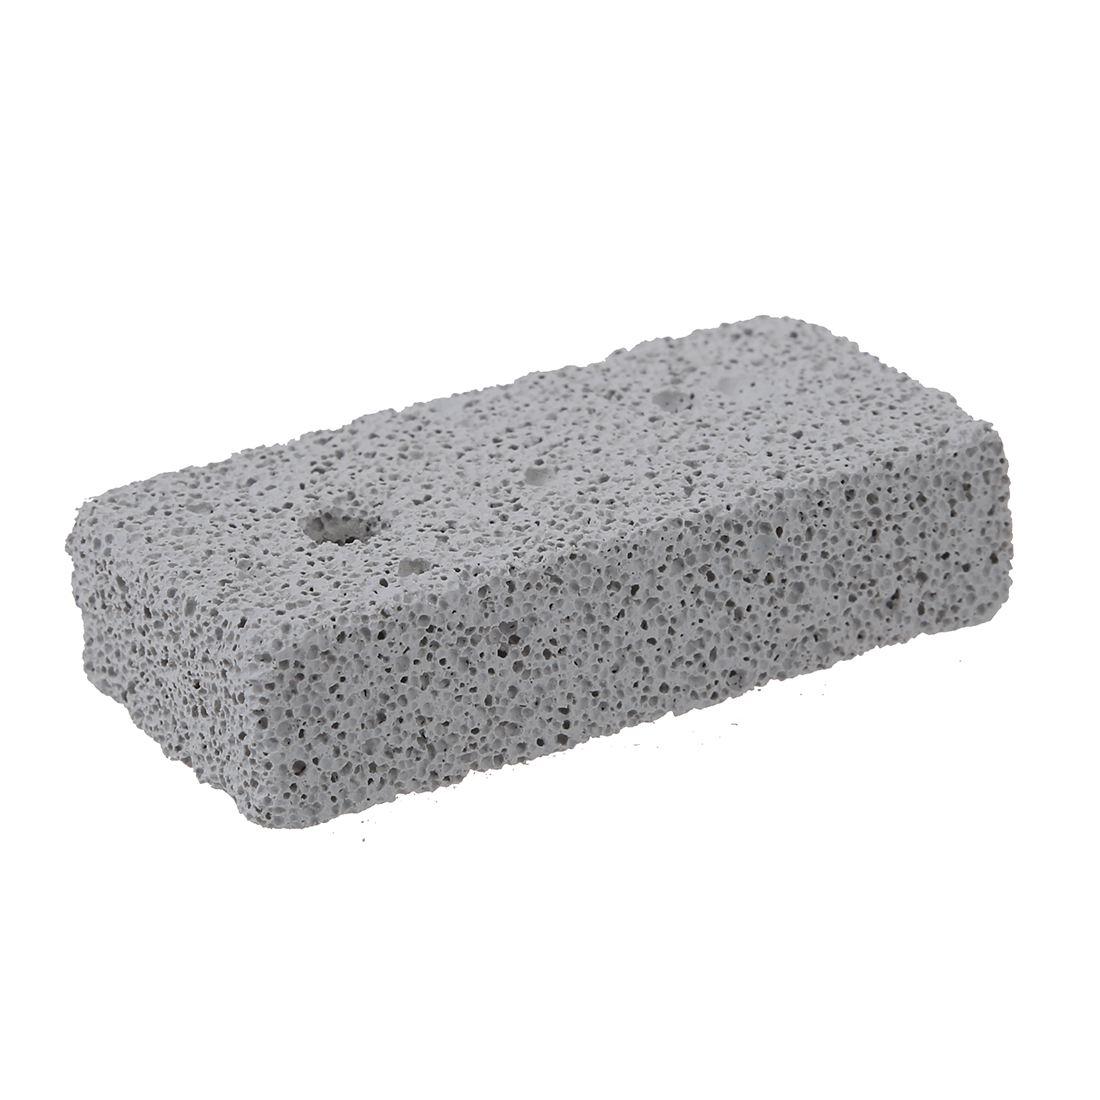 rechteck haustier hamster zaehne schleifen mineralstein. Black Bedroom Furniture Sets. Home Design Ideas